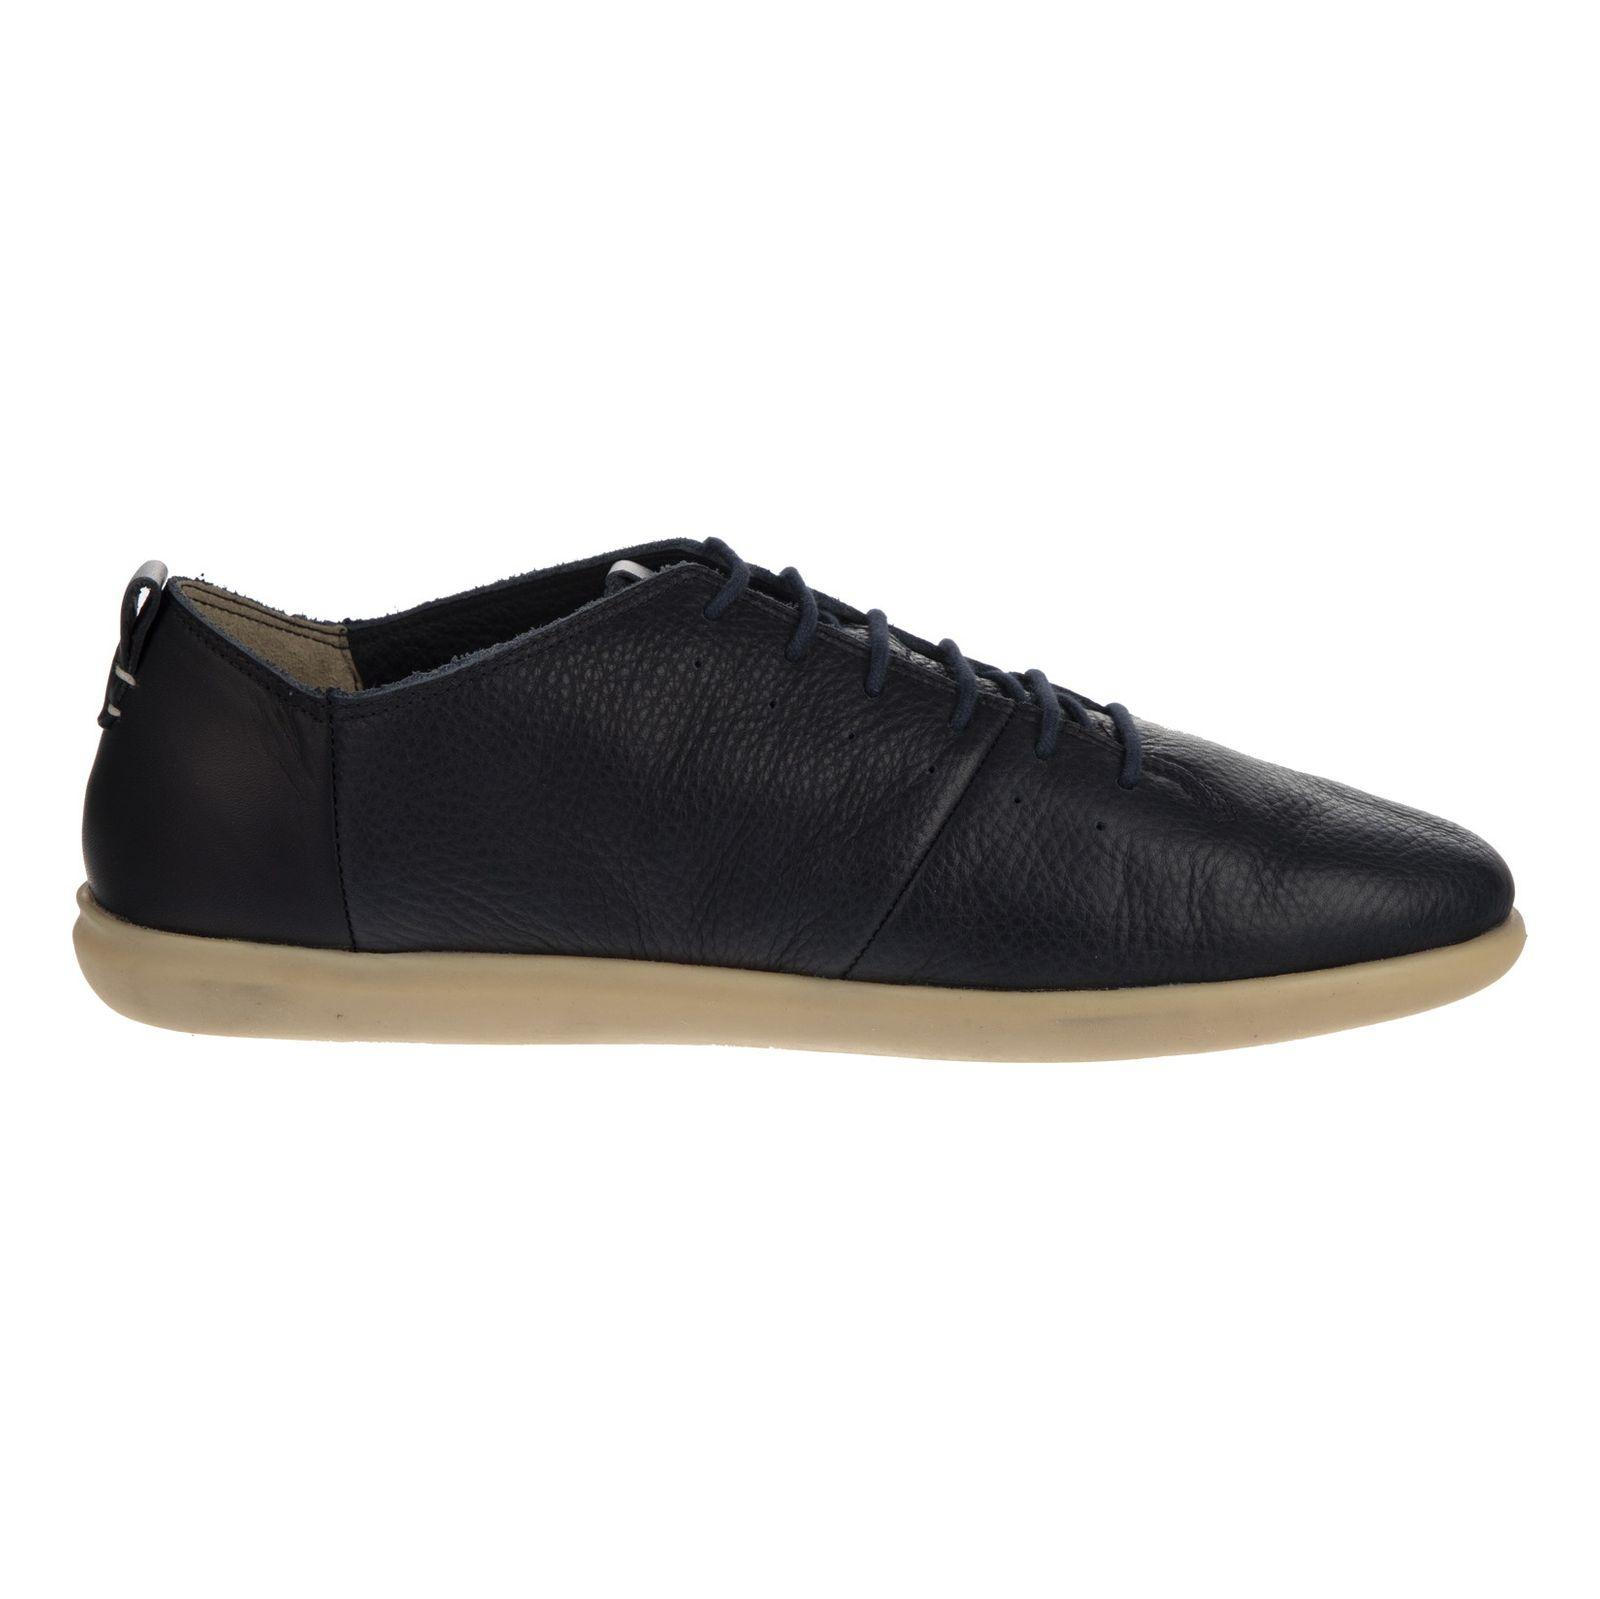 کفش روزمره مردانه جی اوکس مدل U620QB-04643-C4002 -  - 4